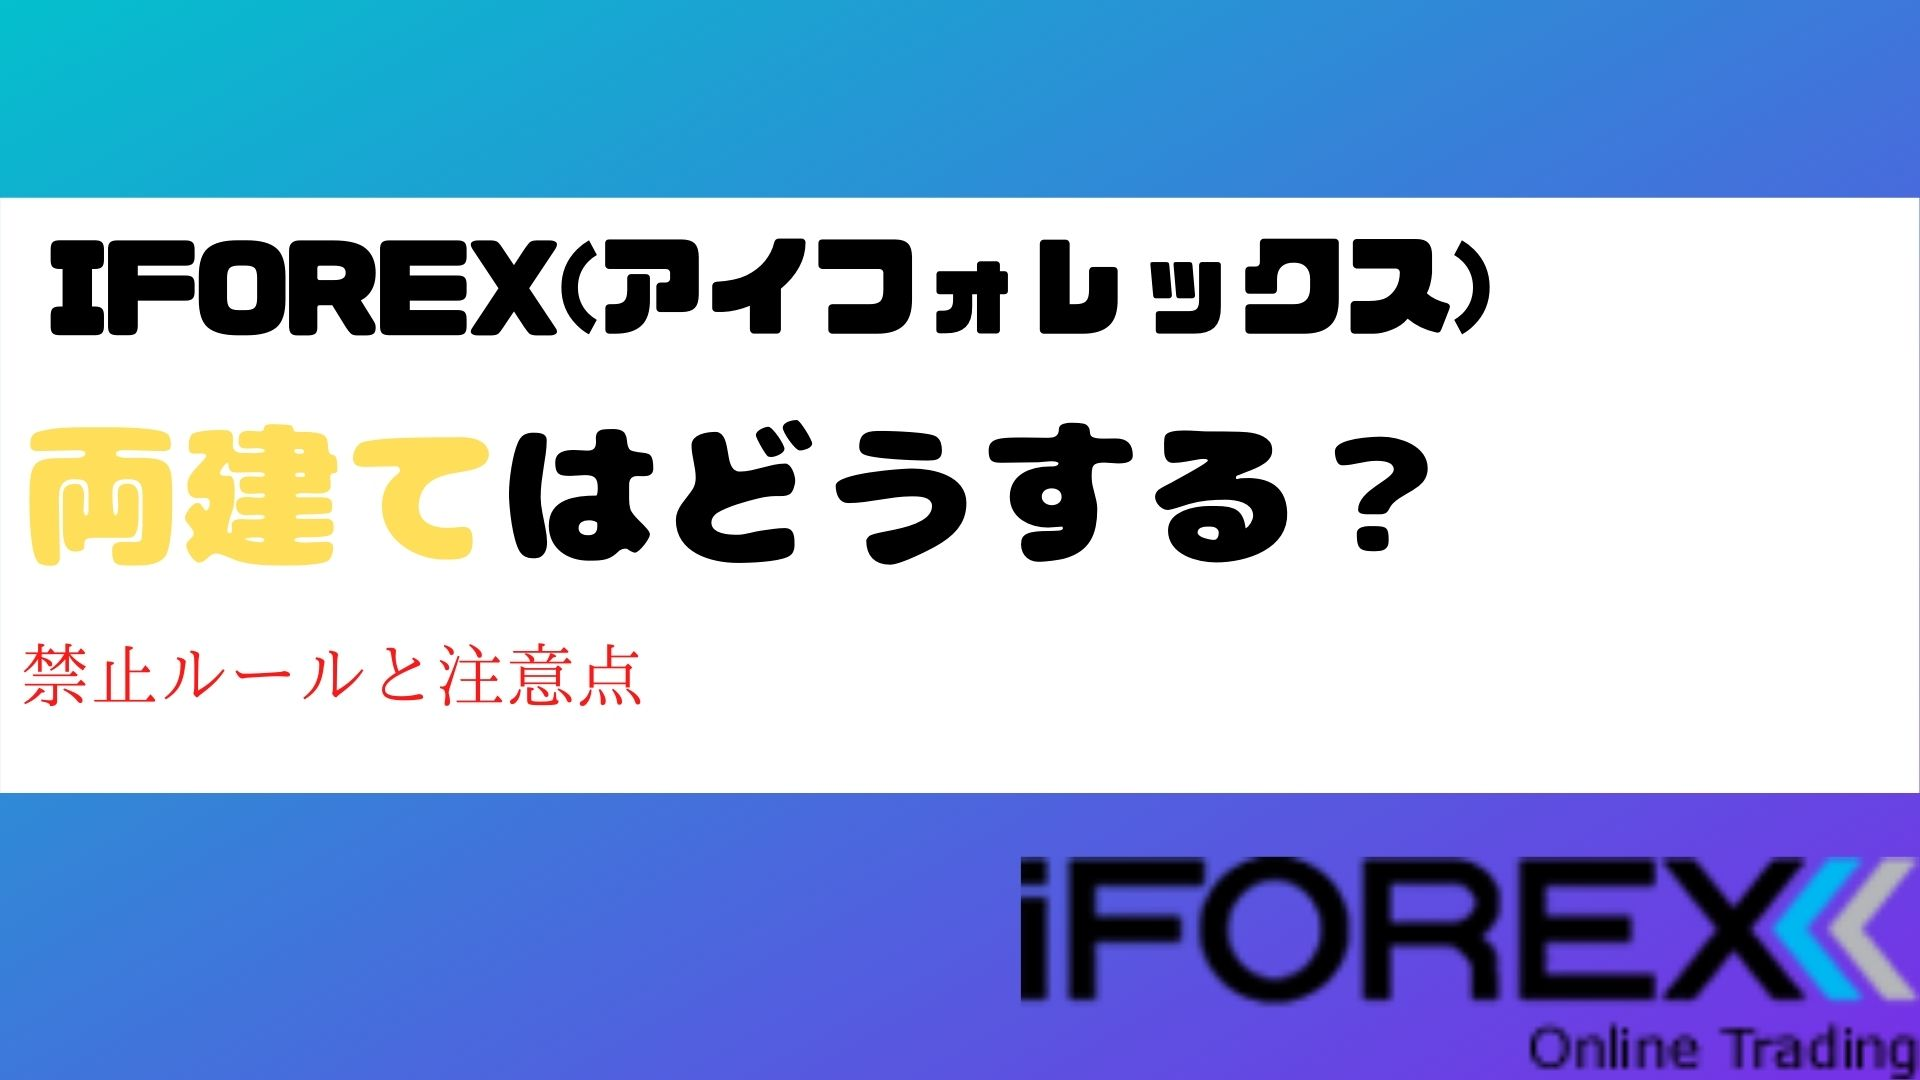 iforex-cross-trader-title